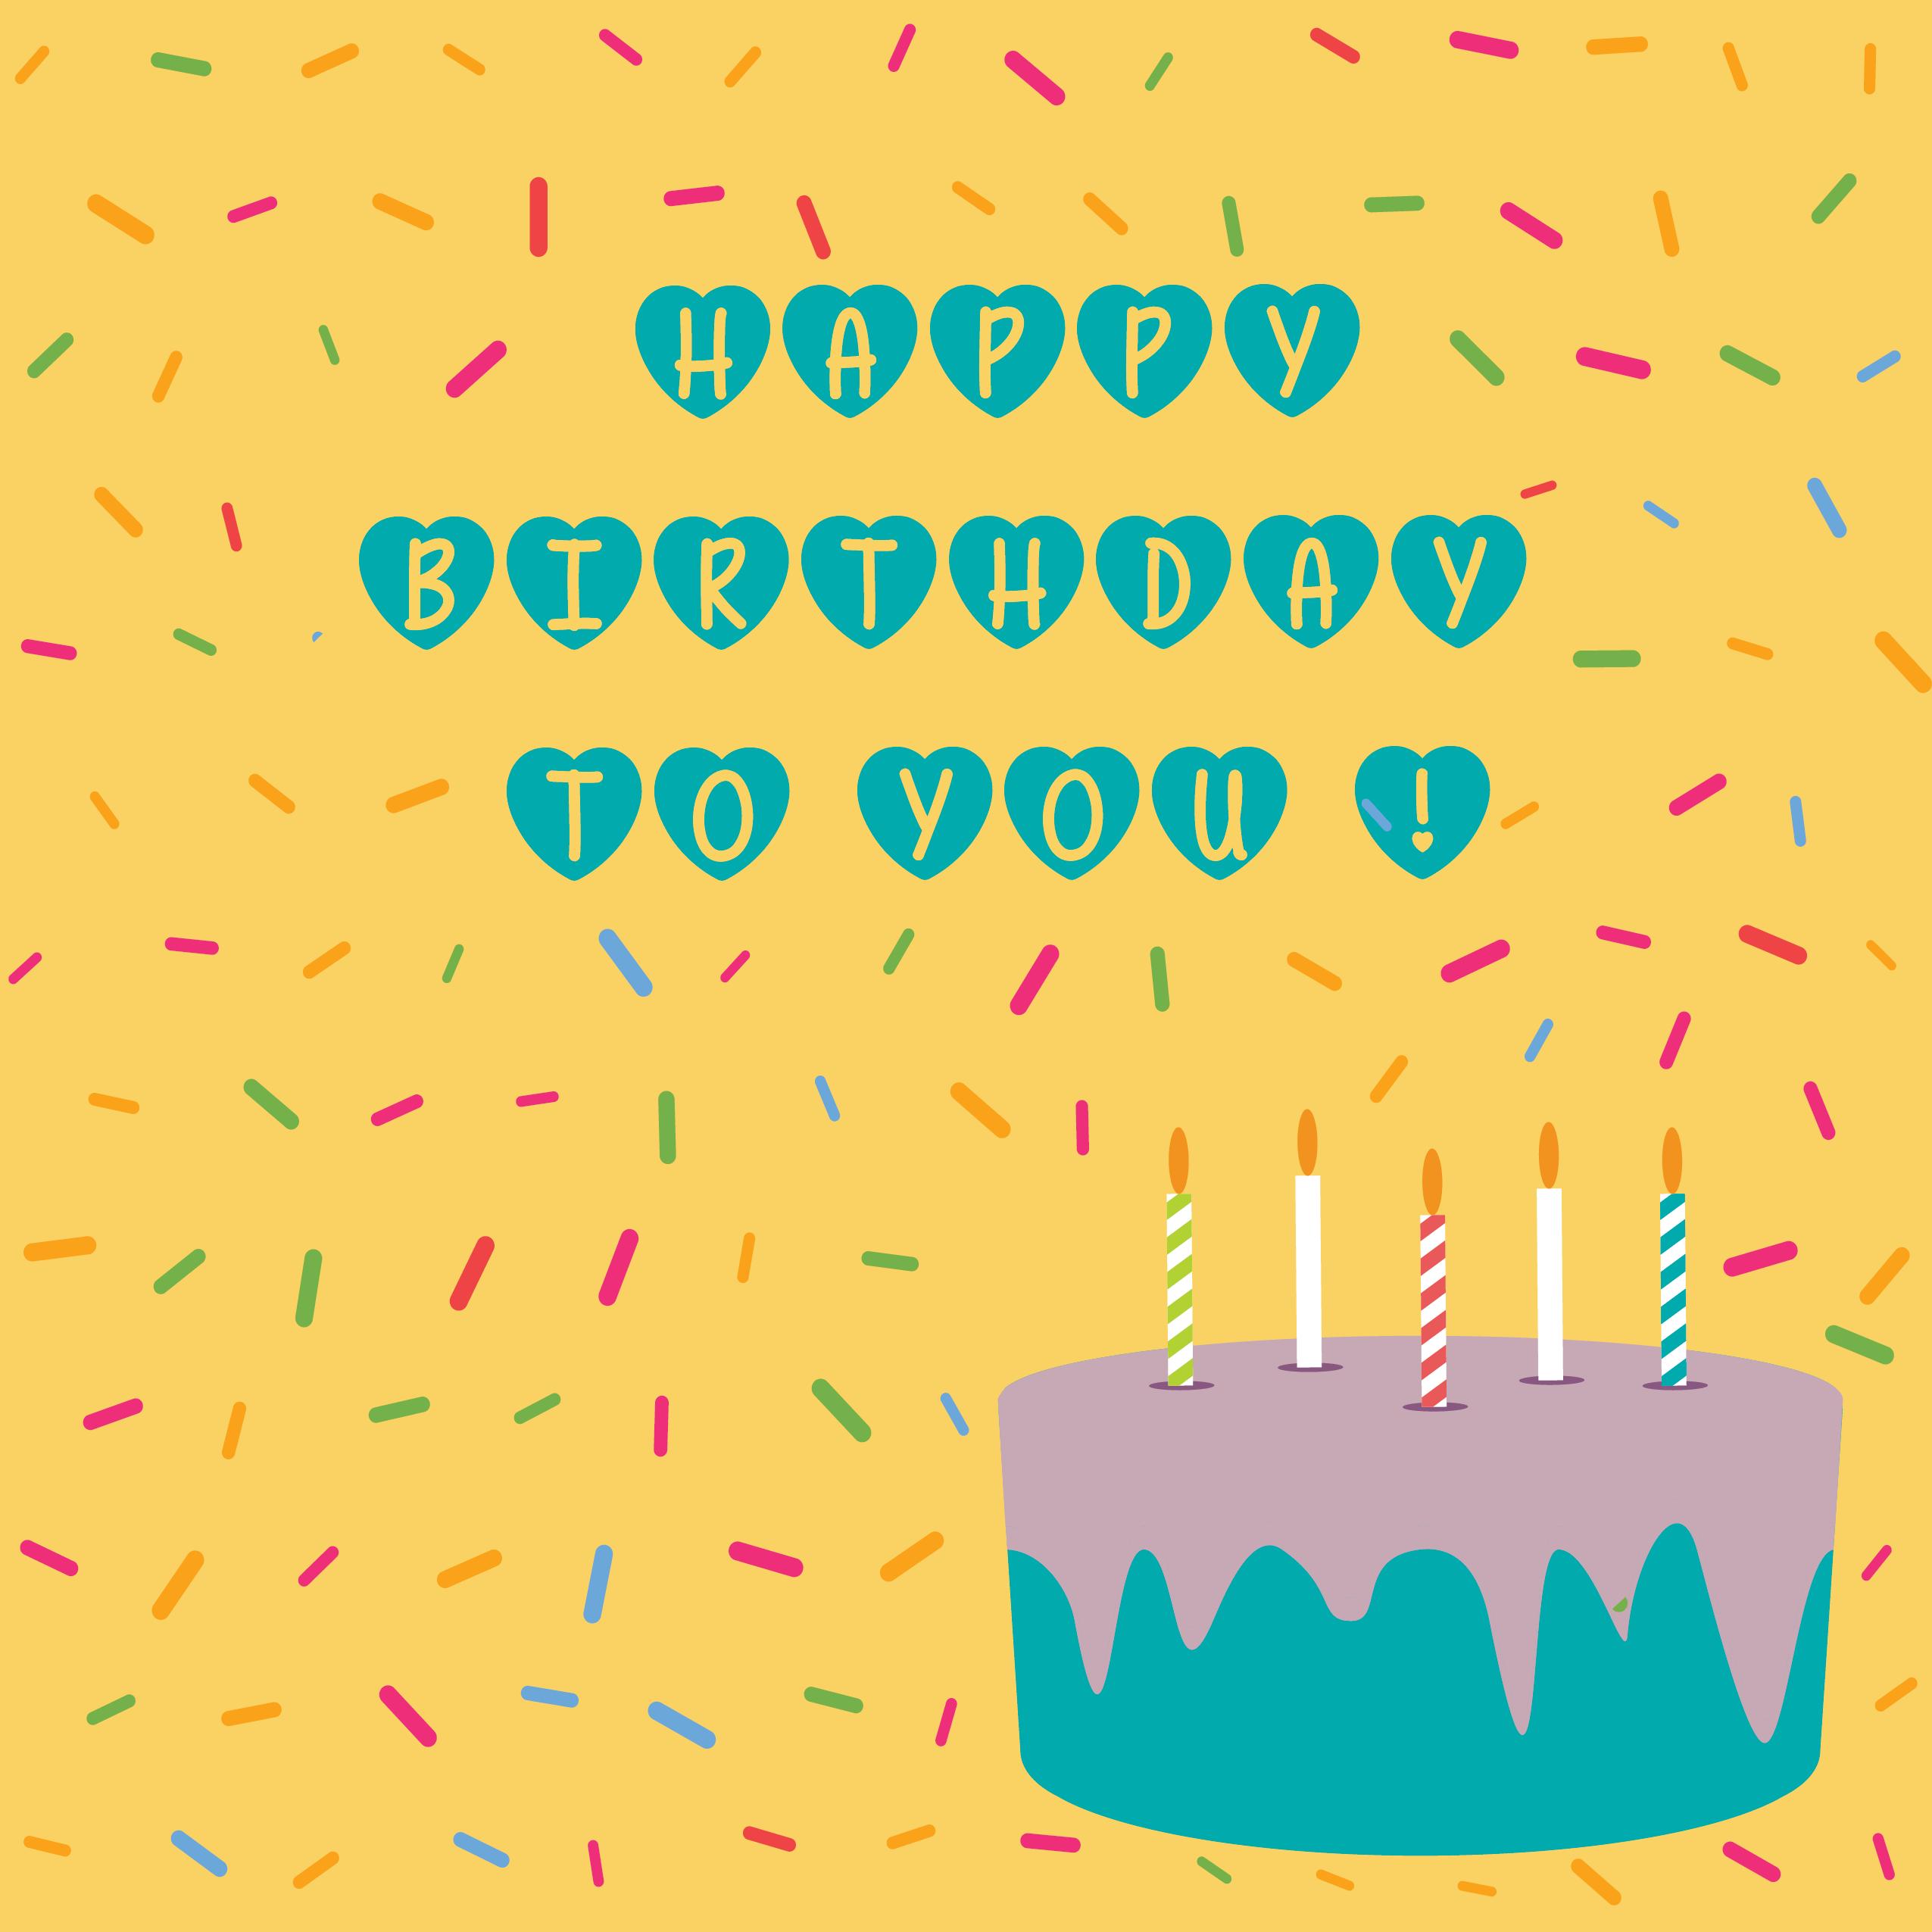 Happy-Birthday-Wishes4